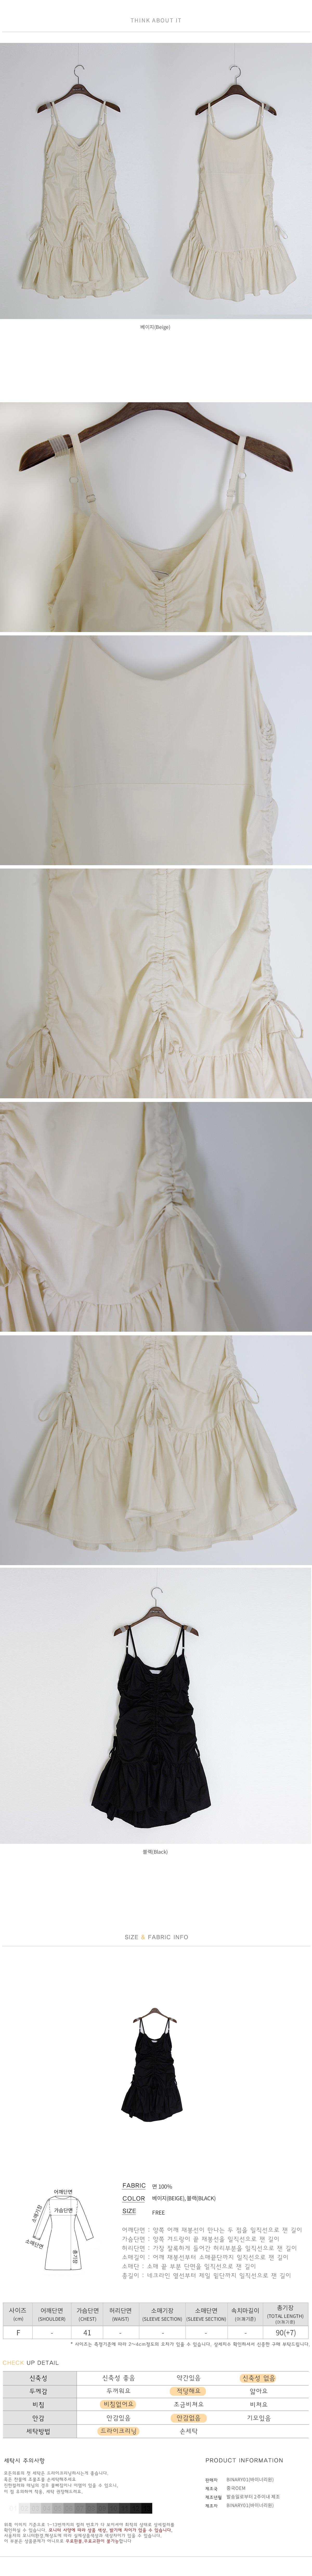 Shearing Joan string dress